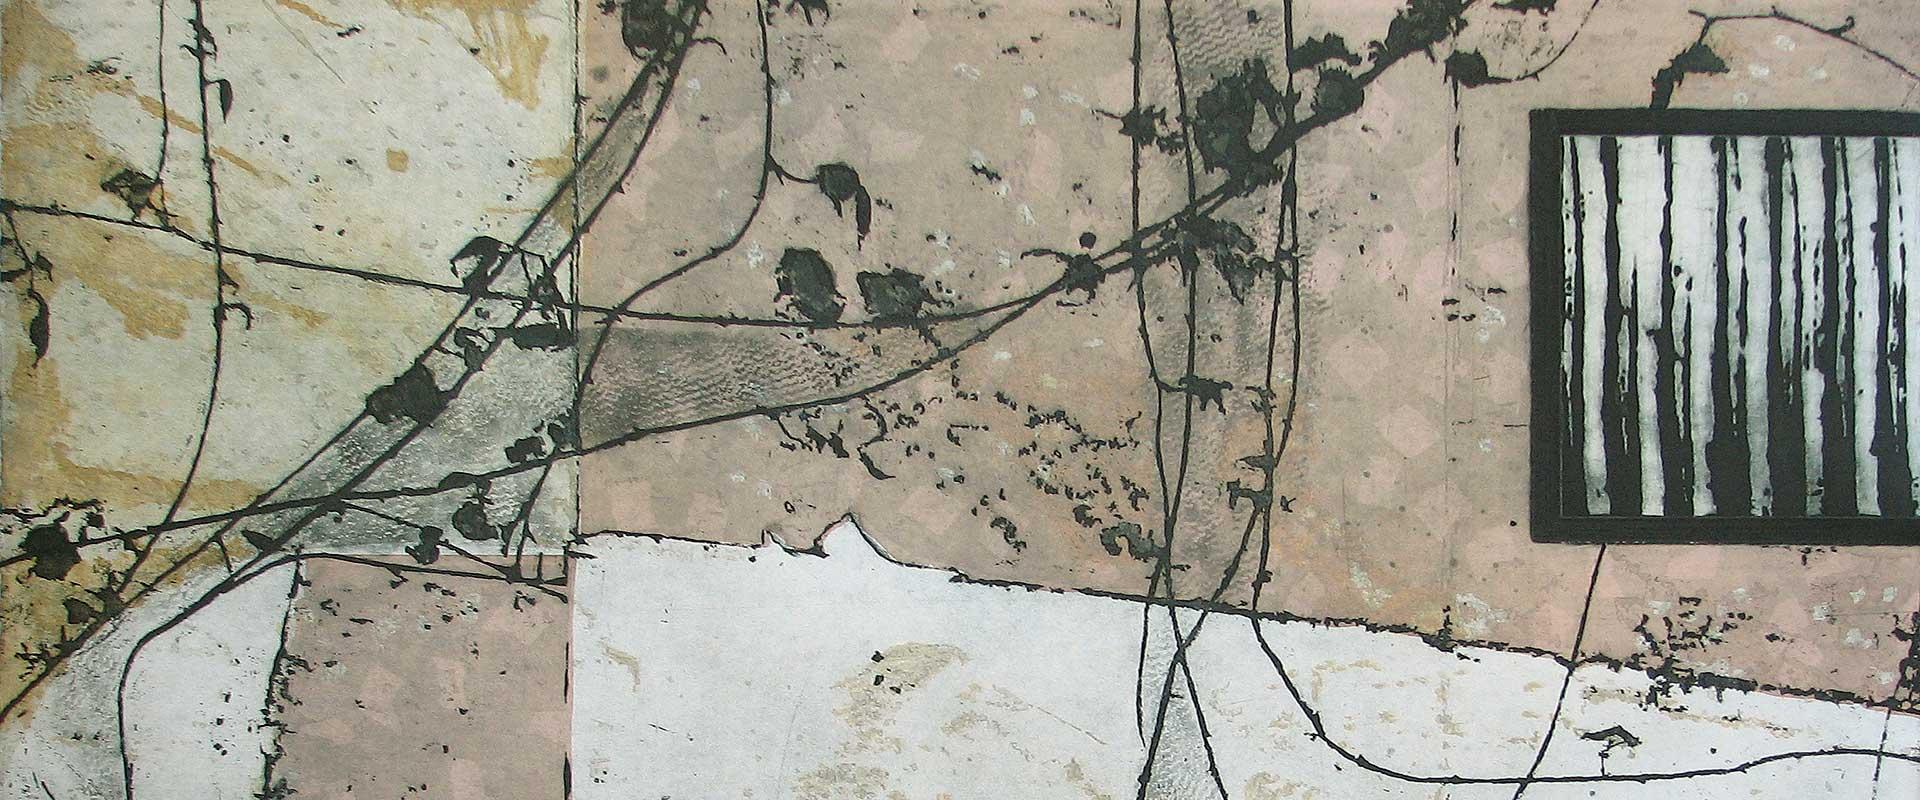 Secret Garden detail of etching and carborundum print by Stephen Vaughan